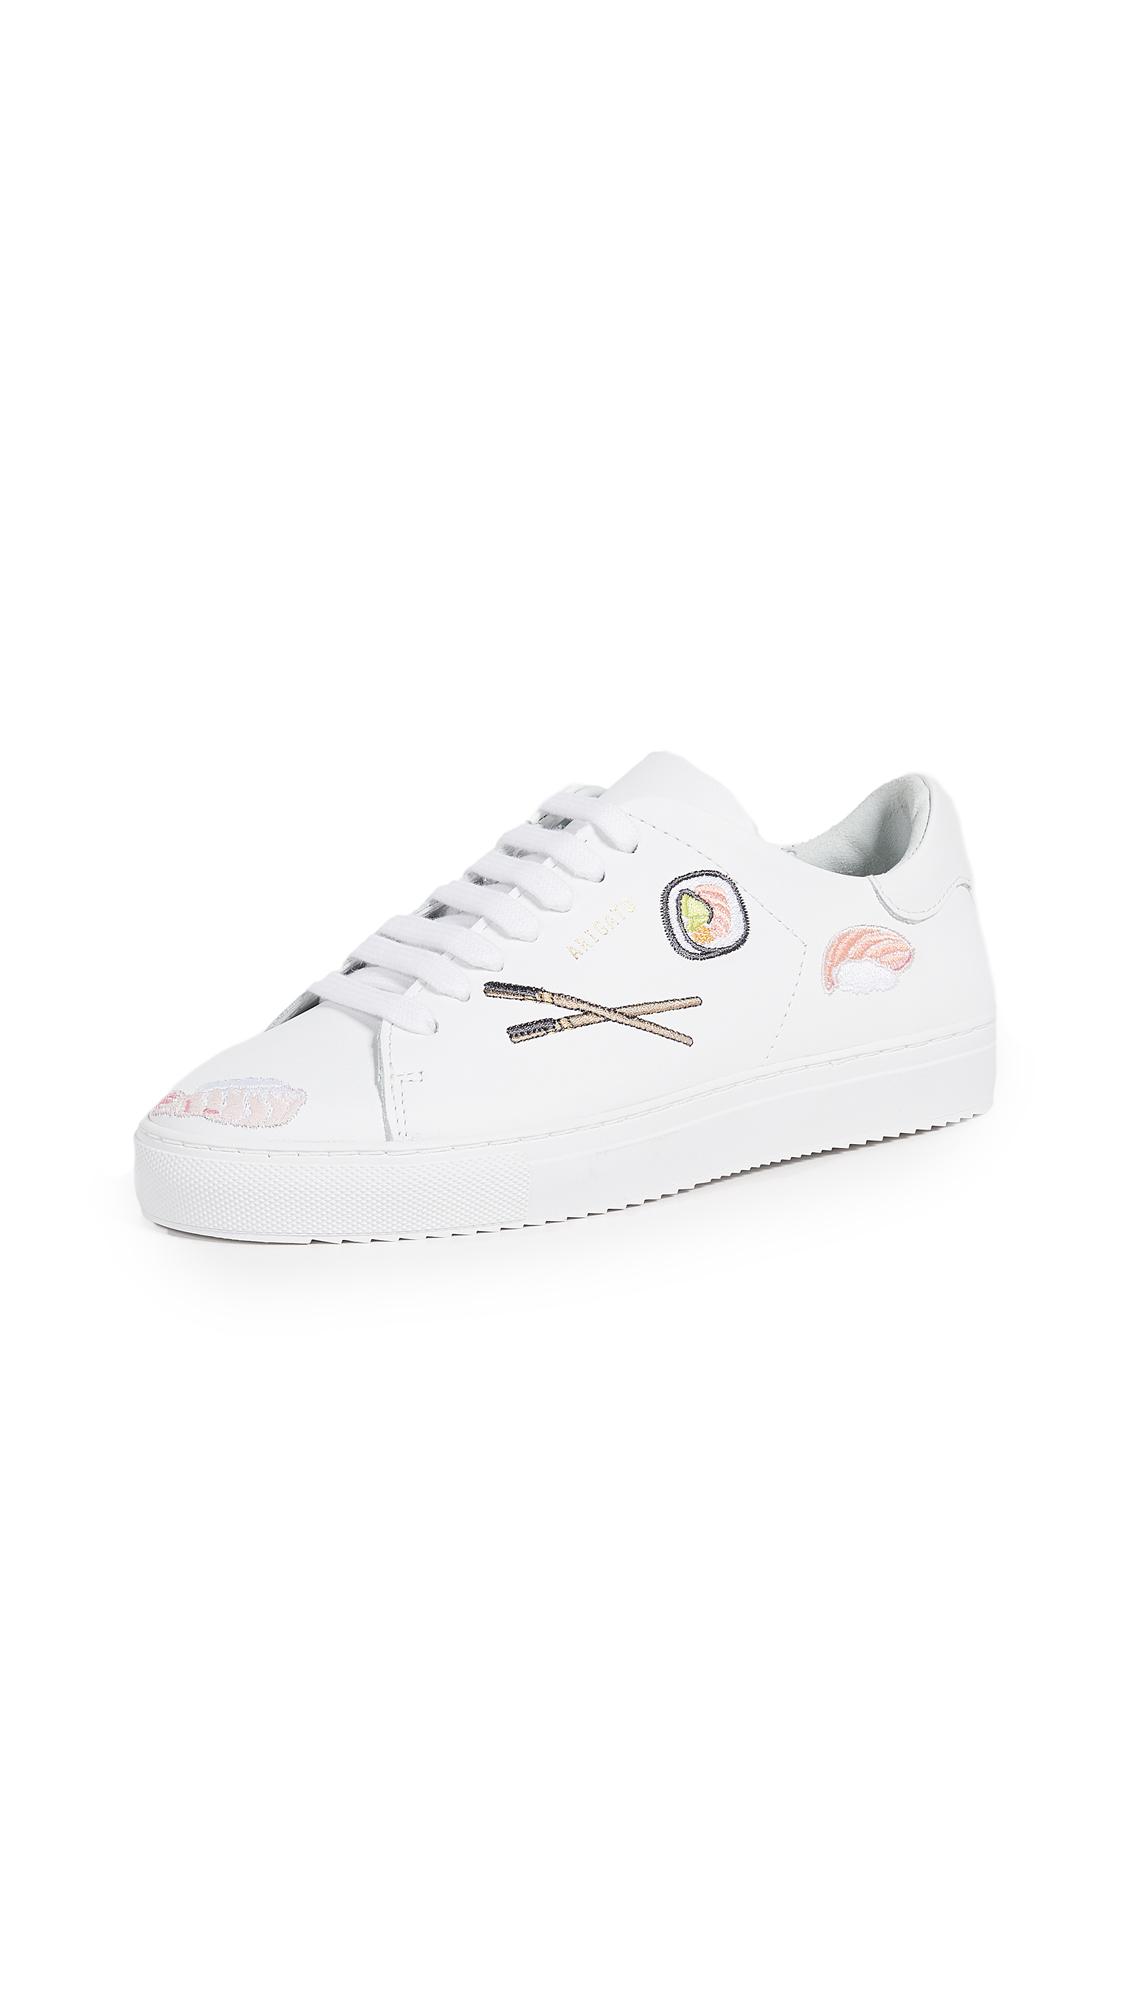 Axel Arigato Clean 90 Sneakers - White